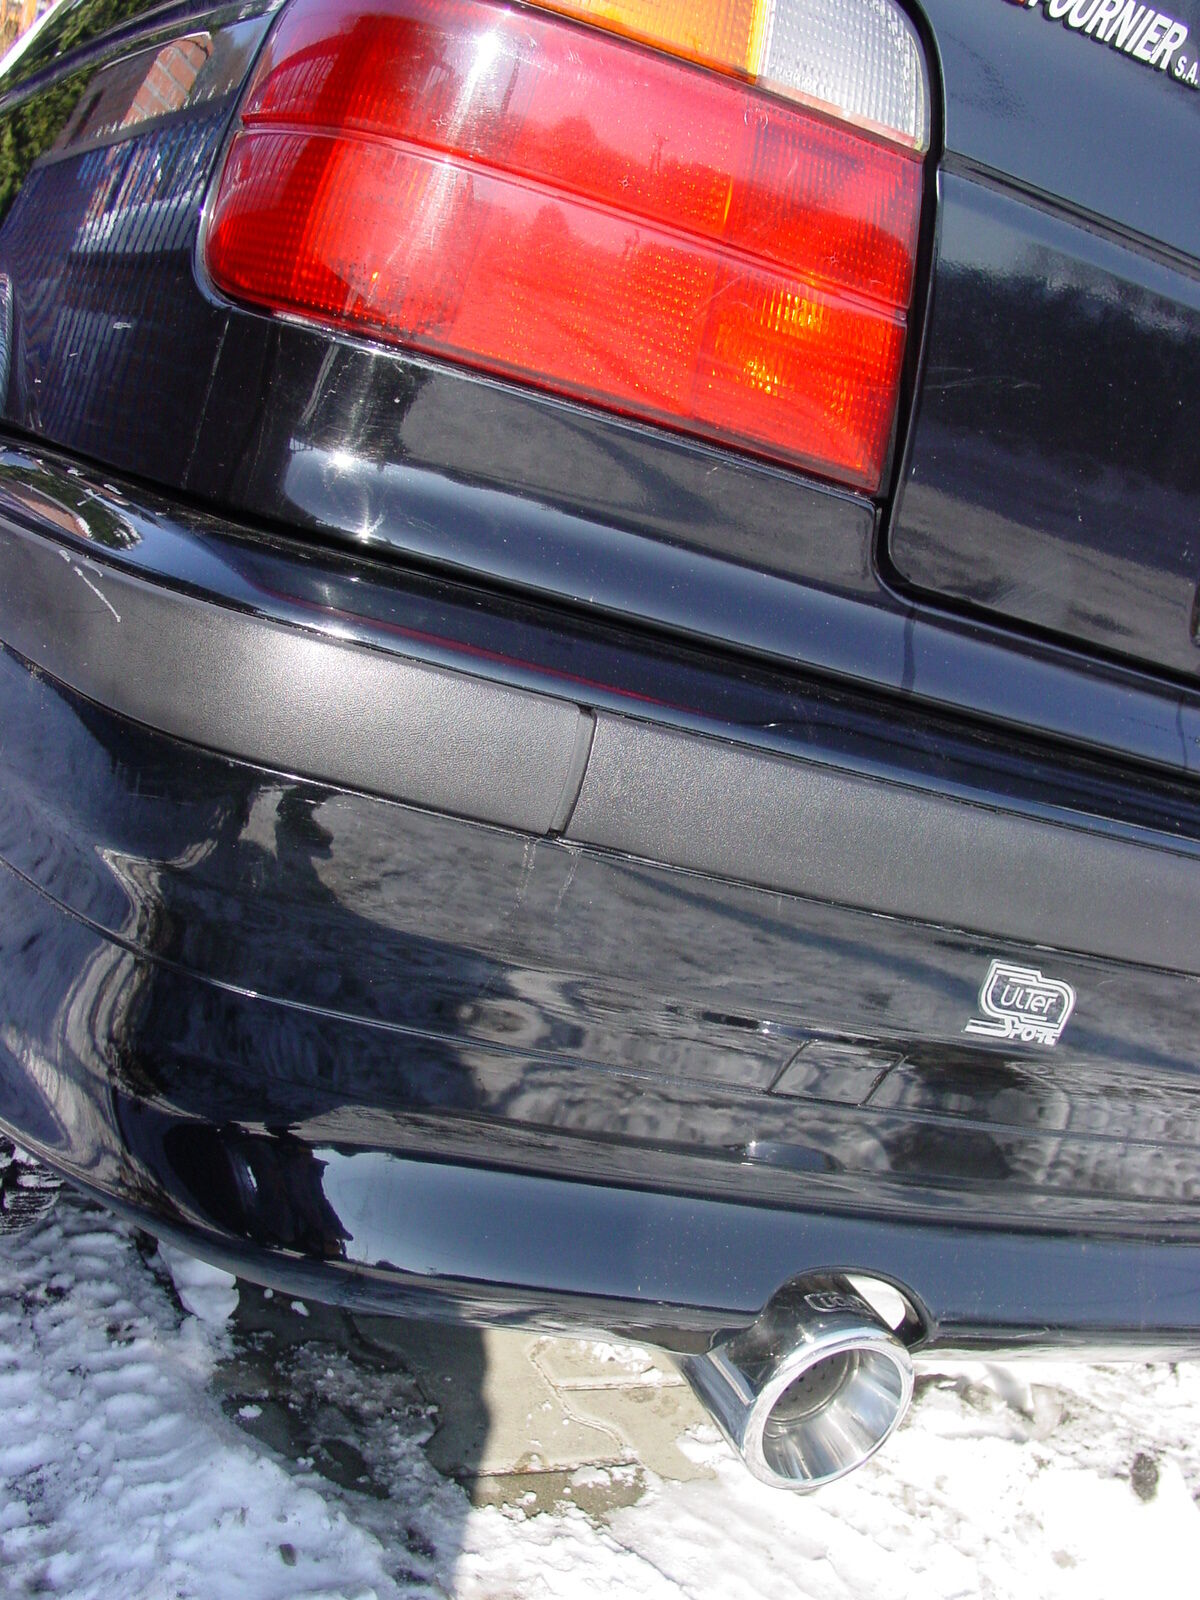 Ulter Sportauspuff BMW 3er E36 COMPACT 94-00 80mm rund eingerollt gerade